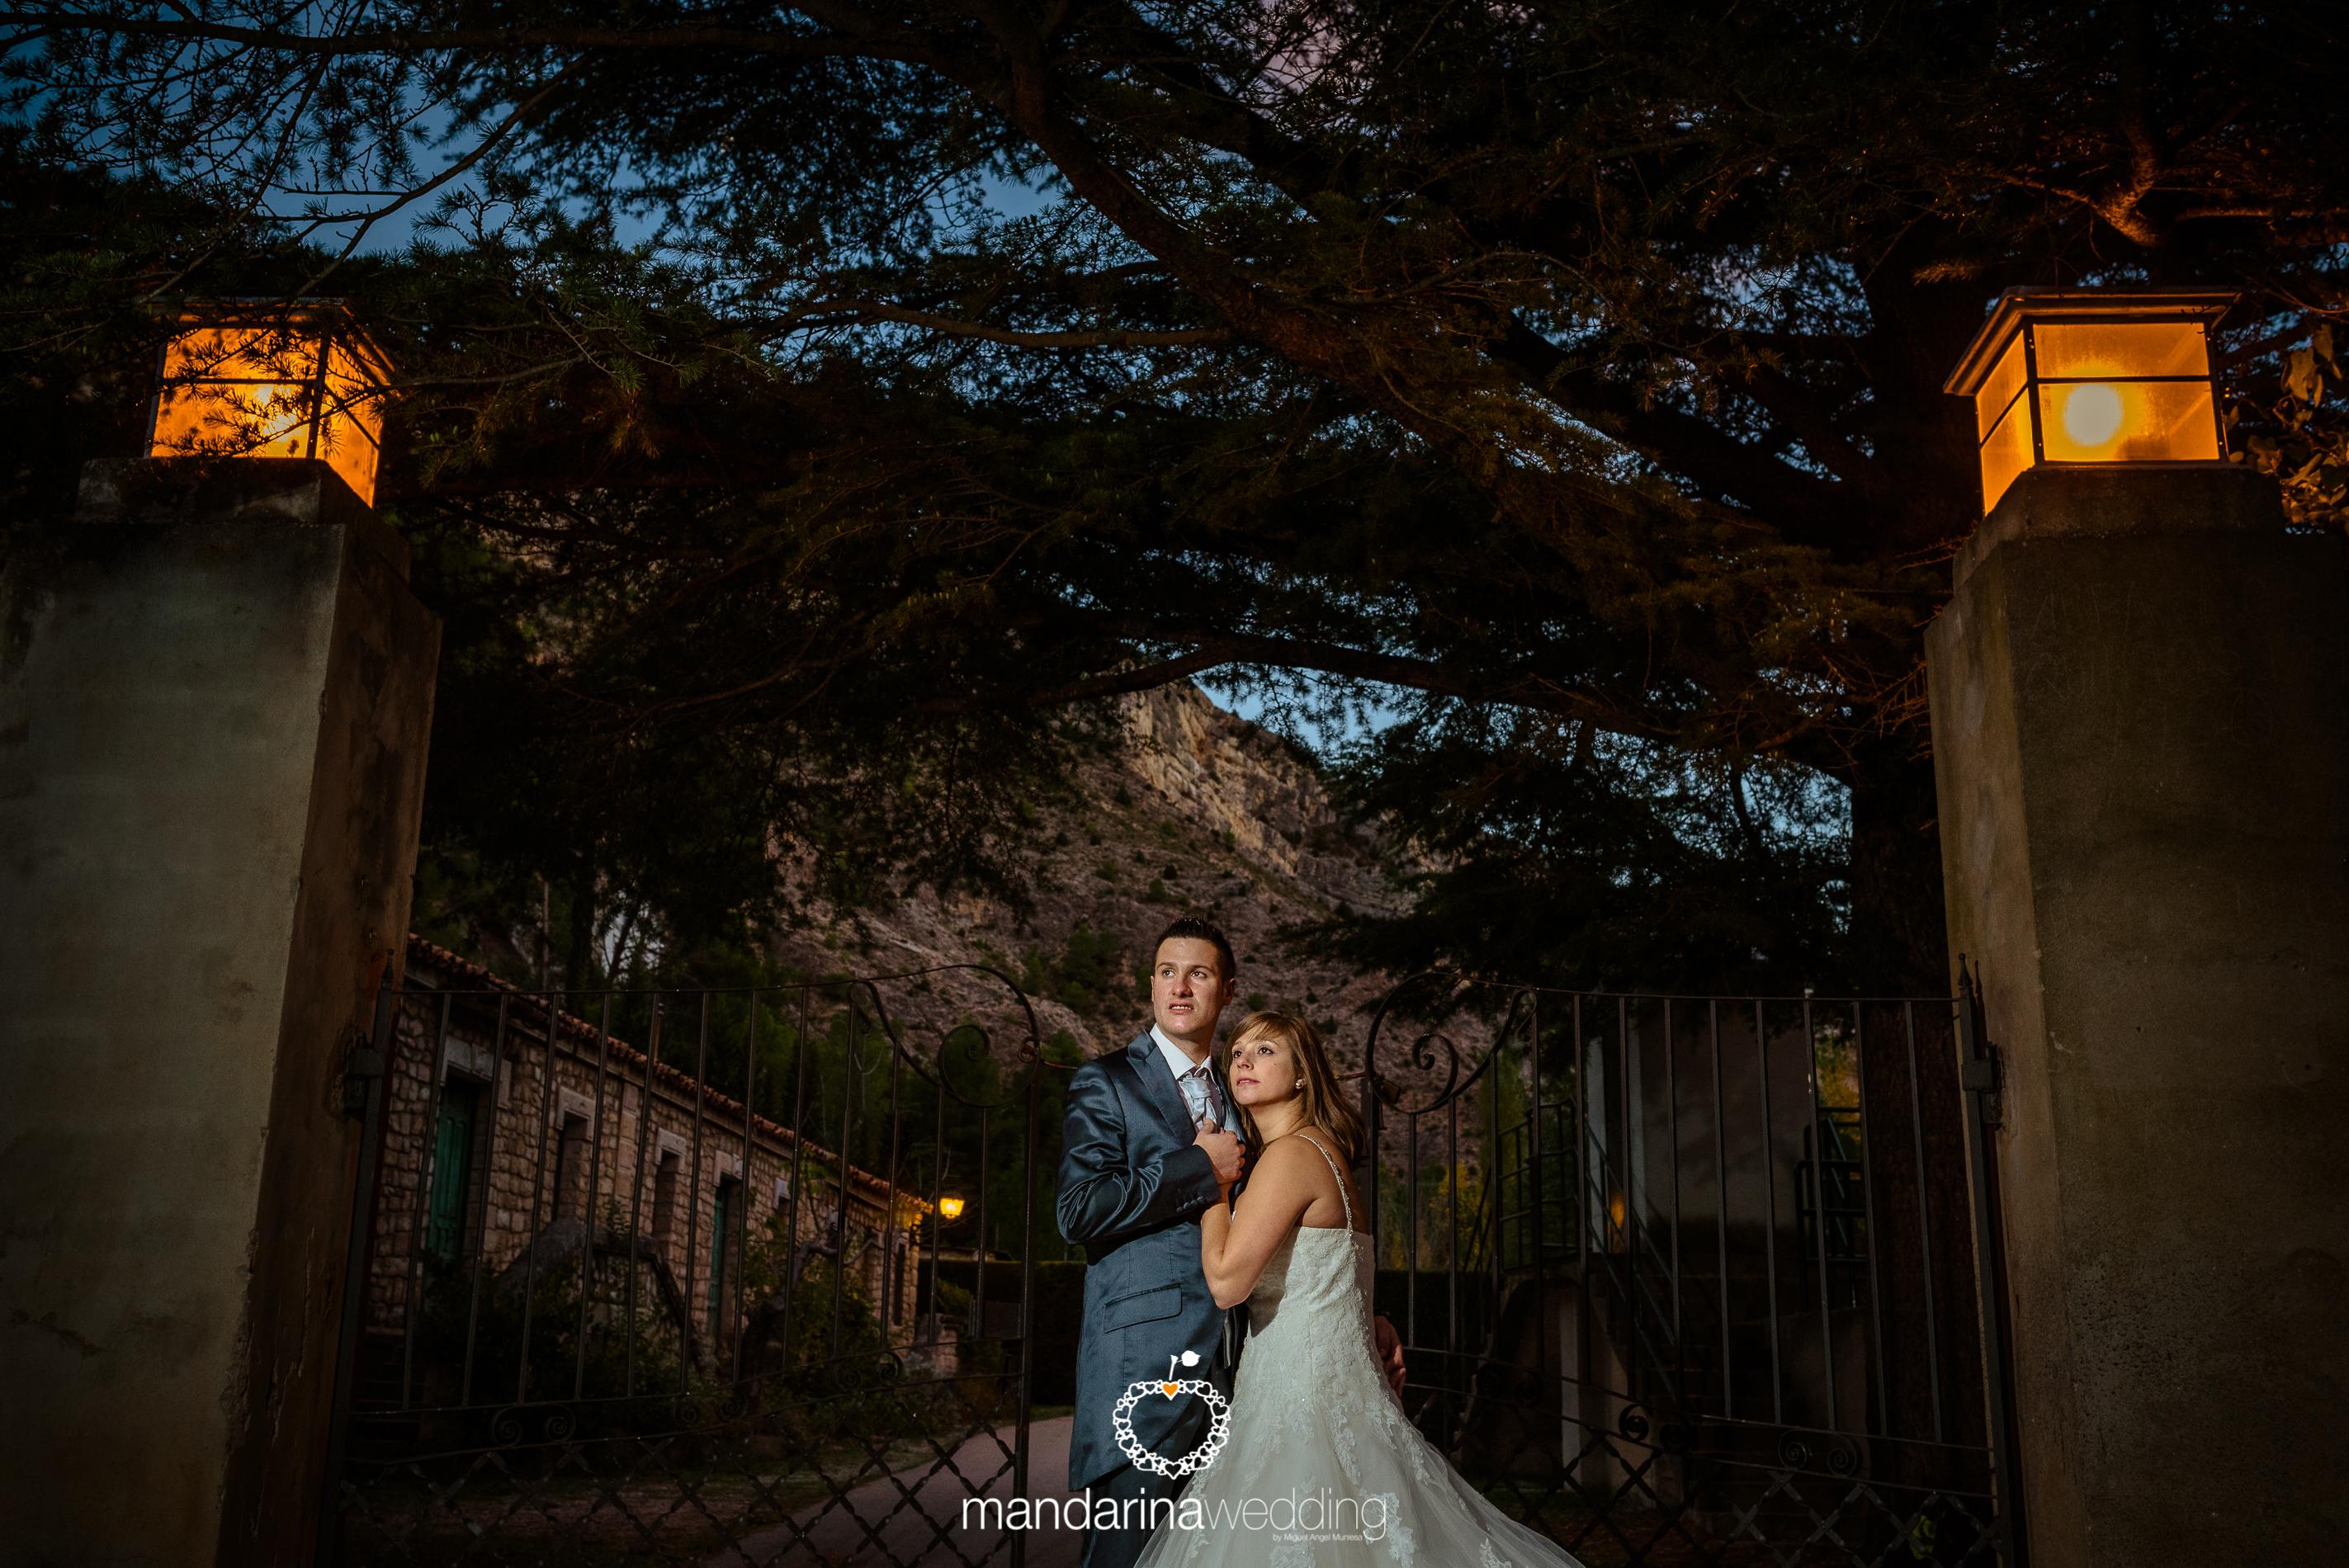 mandarina wedding, fotogarfos boda zaragoza, postboda, postboda en oliete, fotografos boda teruel, fotografos huesca_01